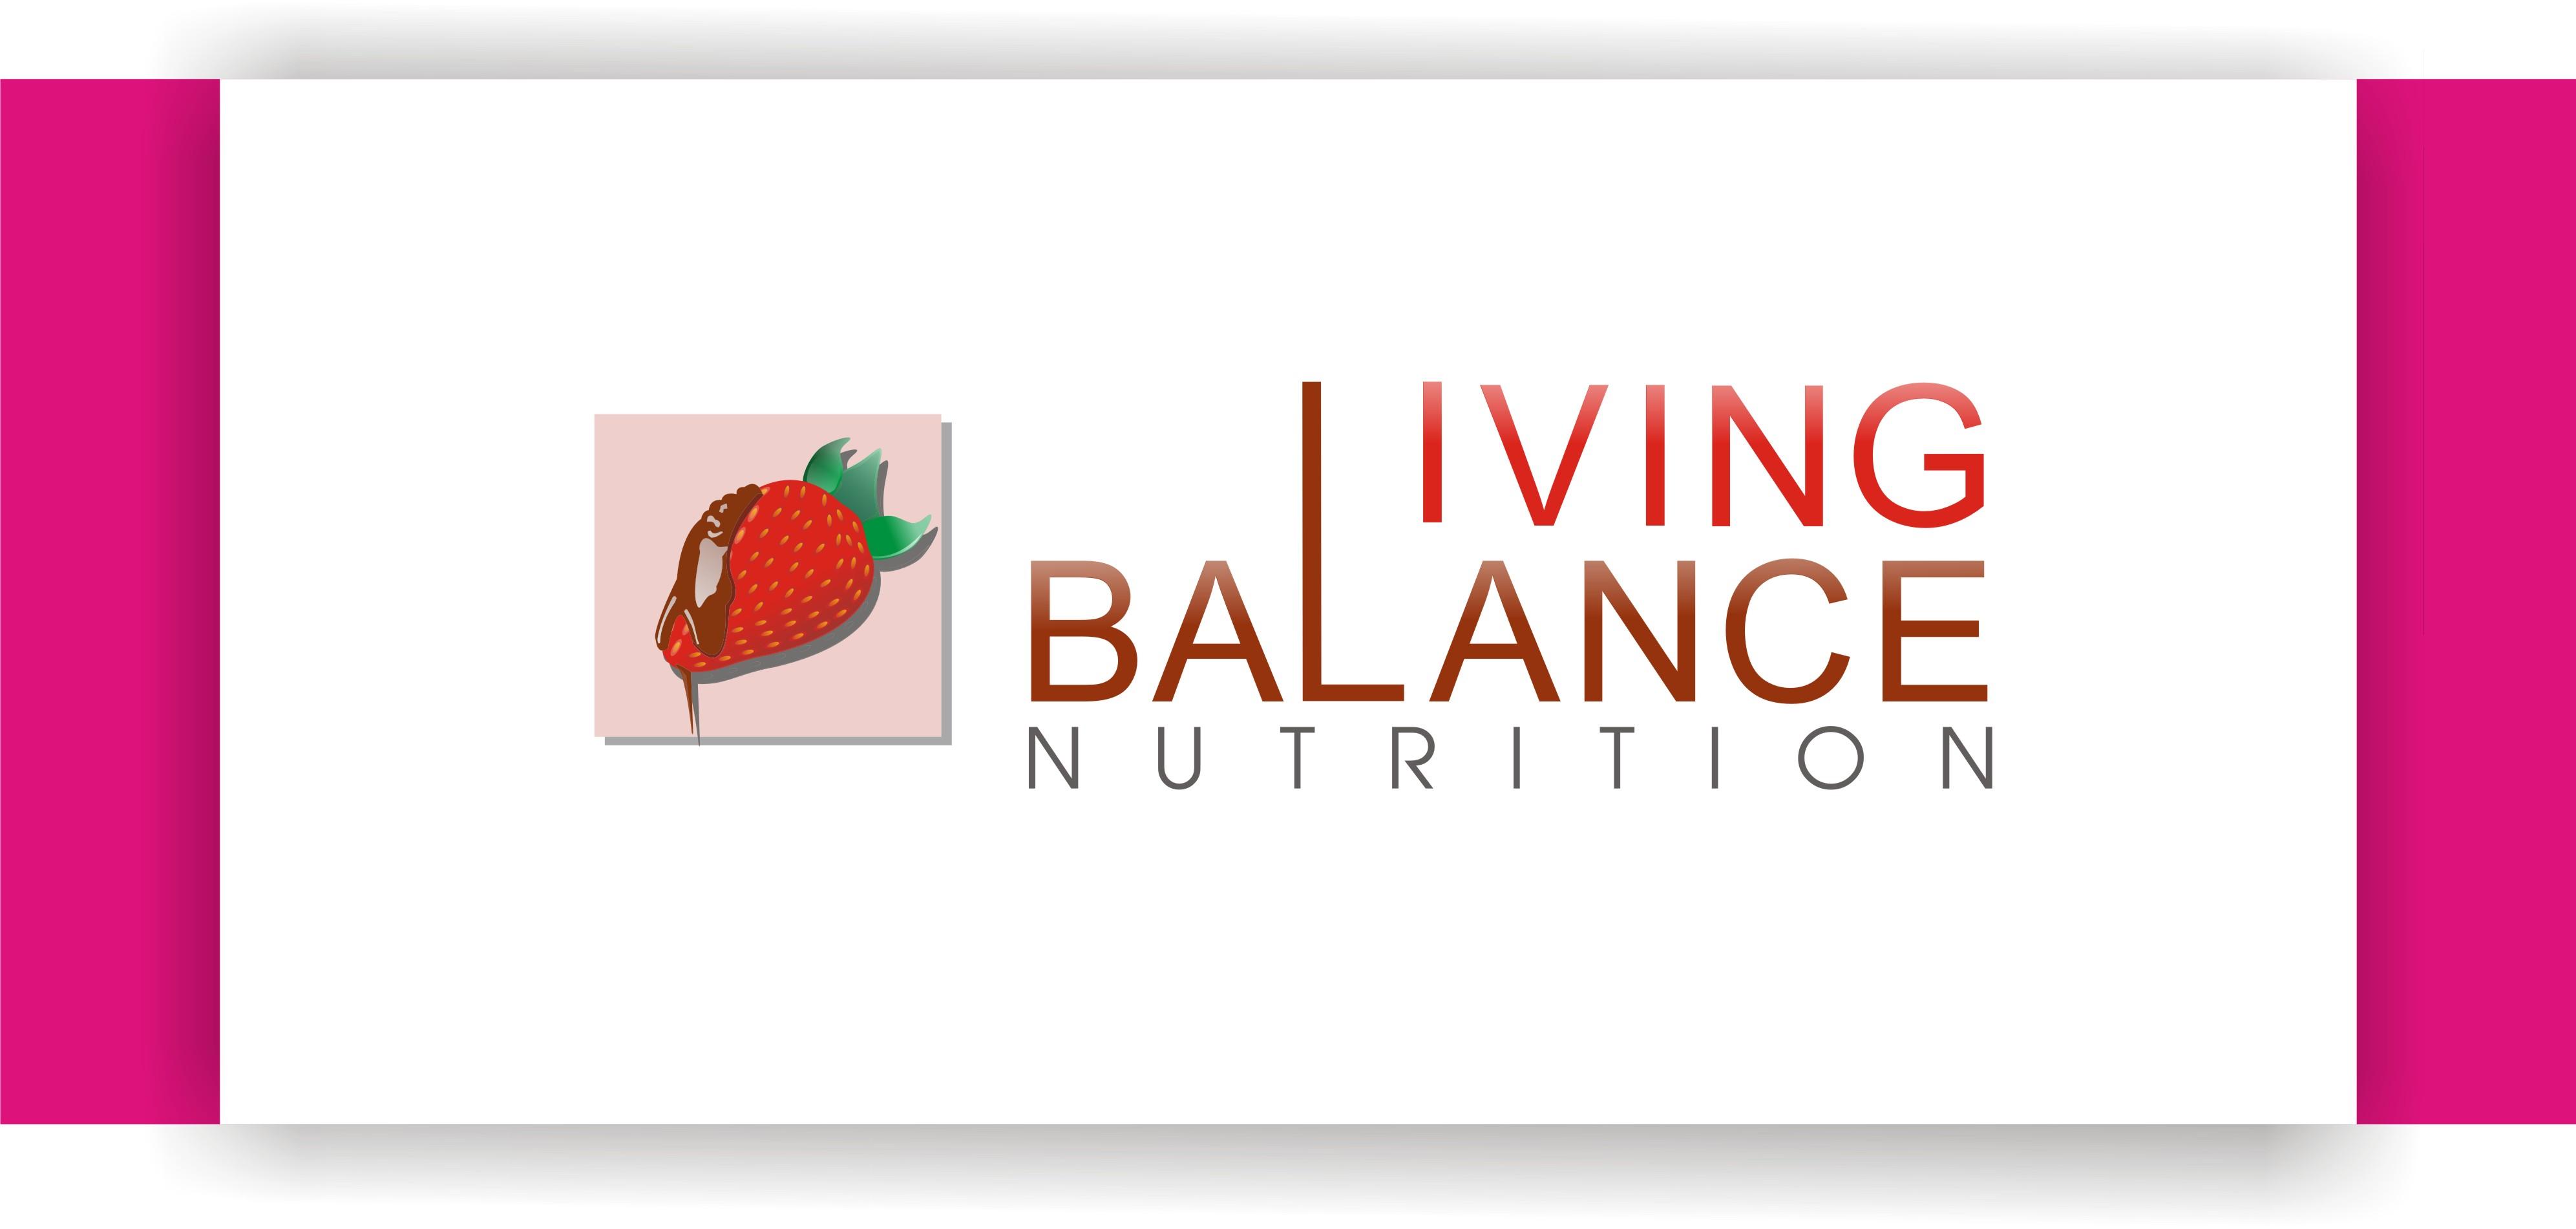 Logo Design by Shailender Kumar - Entry No. 11 in the Logo Design Contest Unique Logo Design Wanted for Living Balance Nutrition.